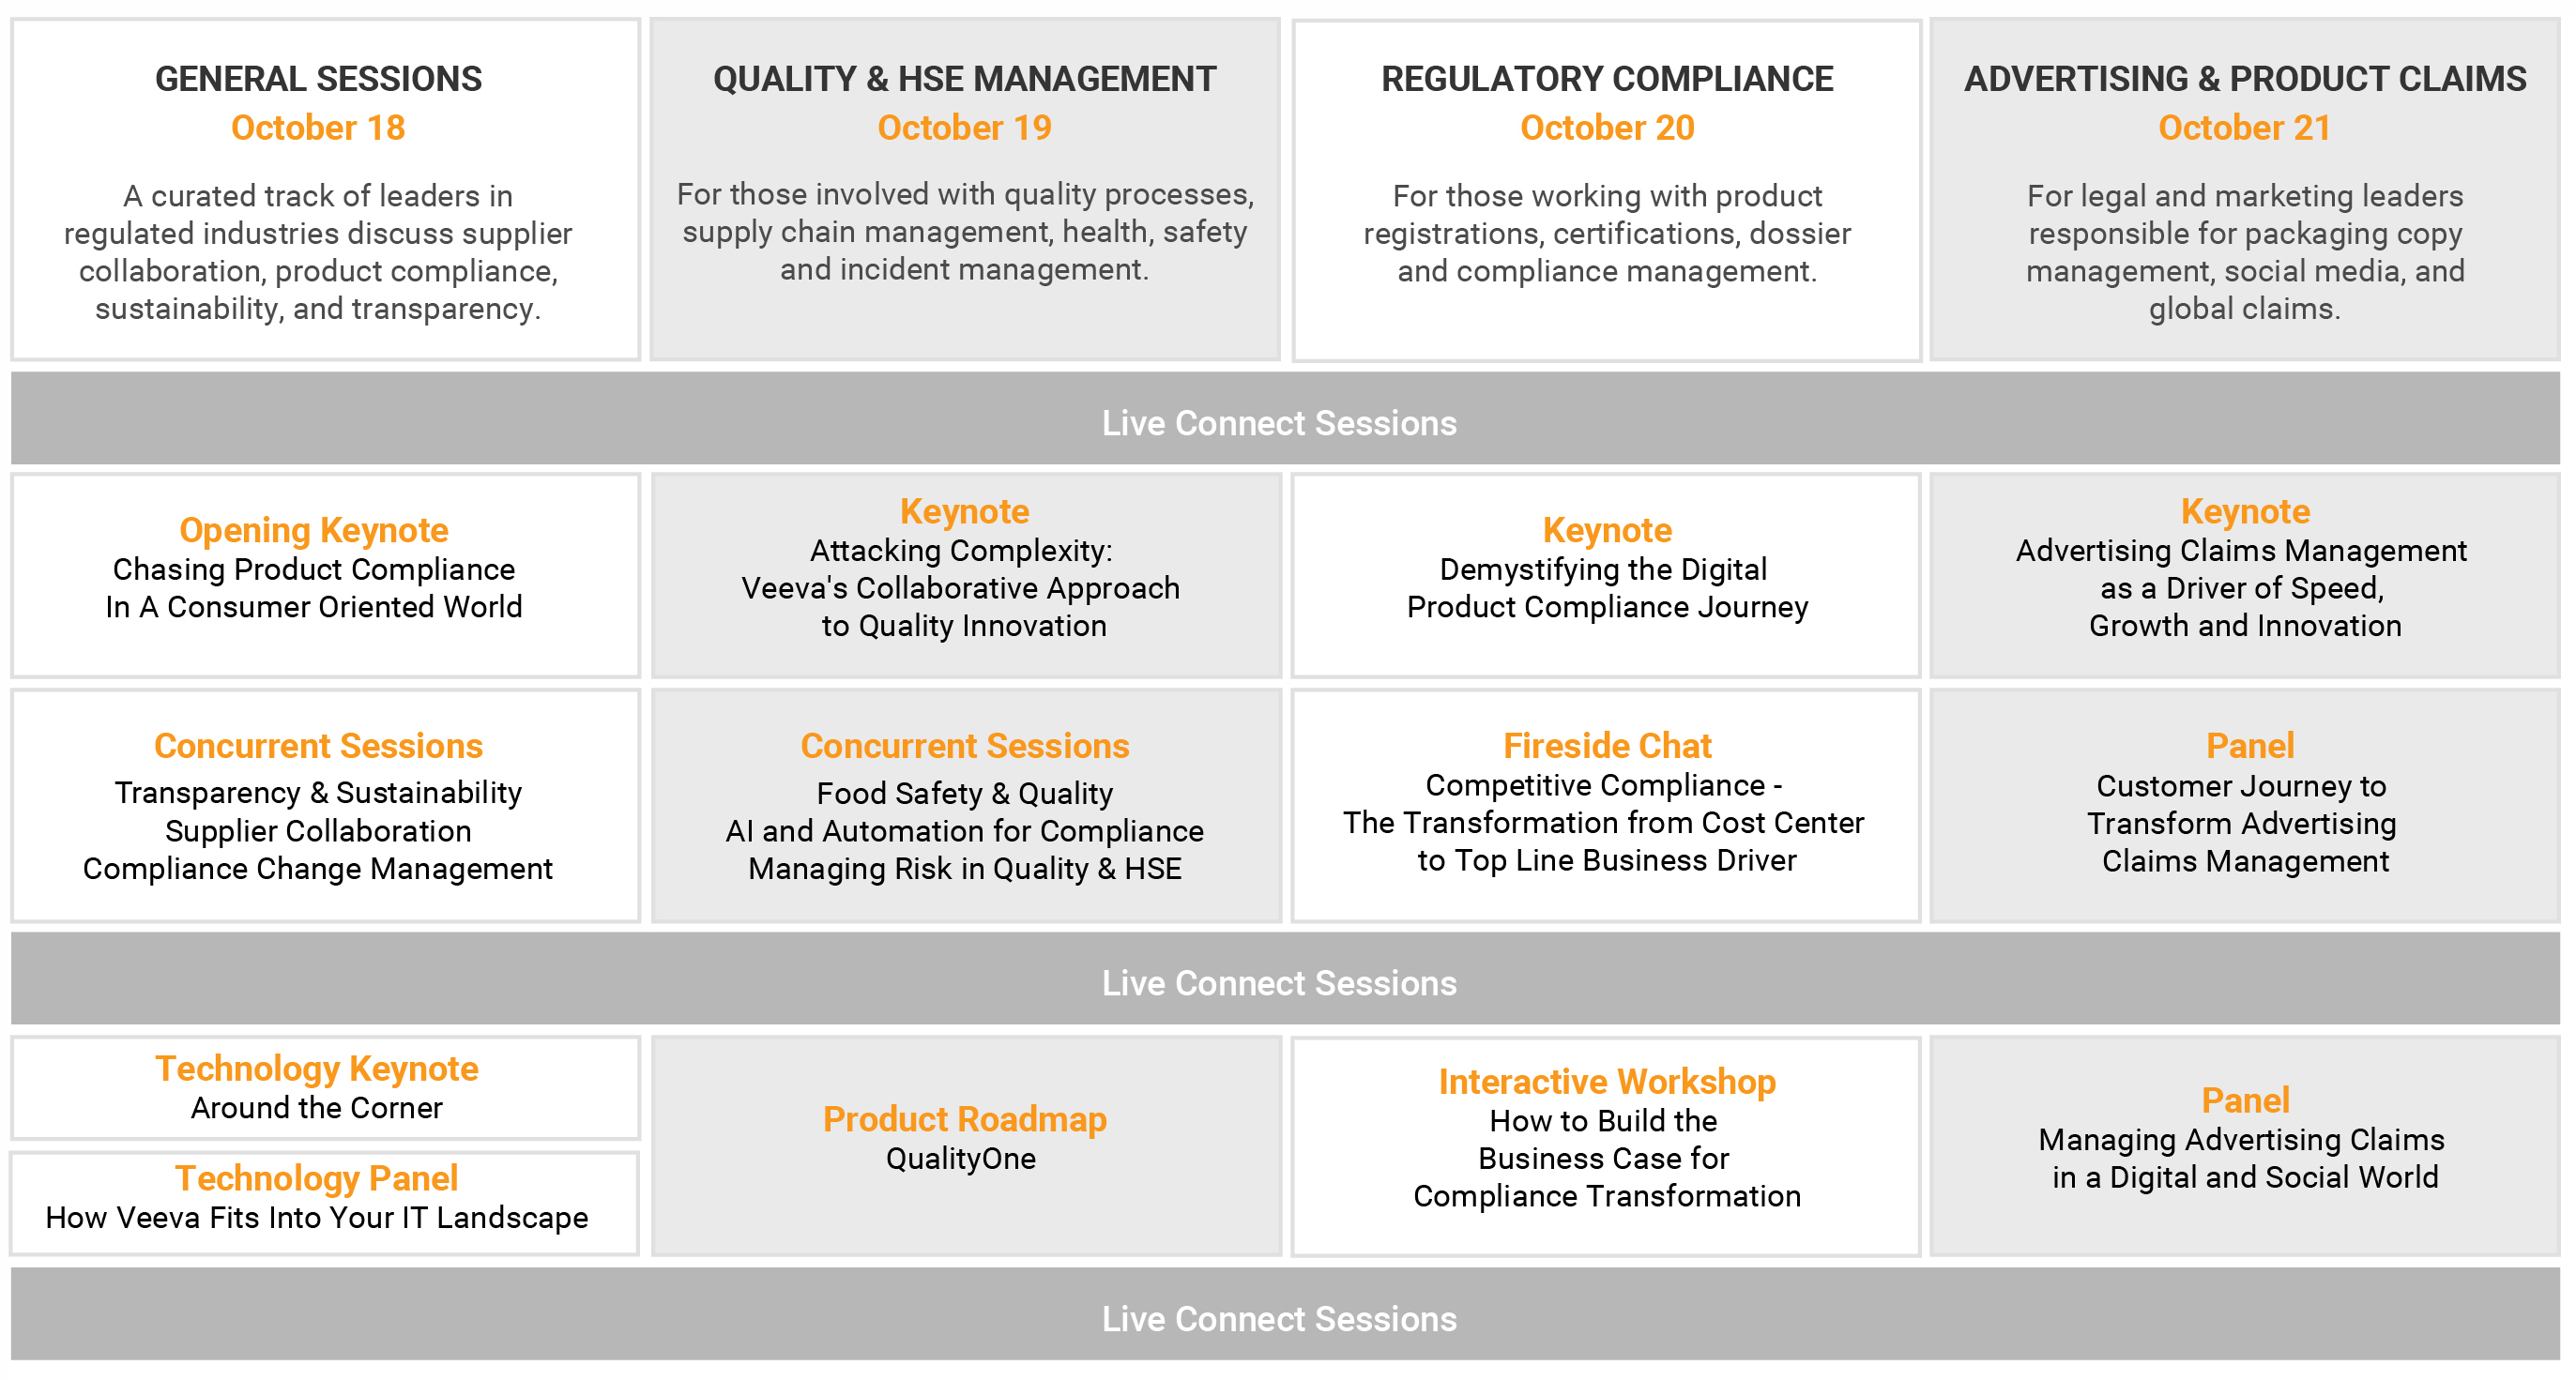 Veeva 2021 Summit Agenda at a Glance